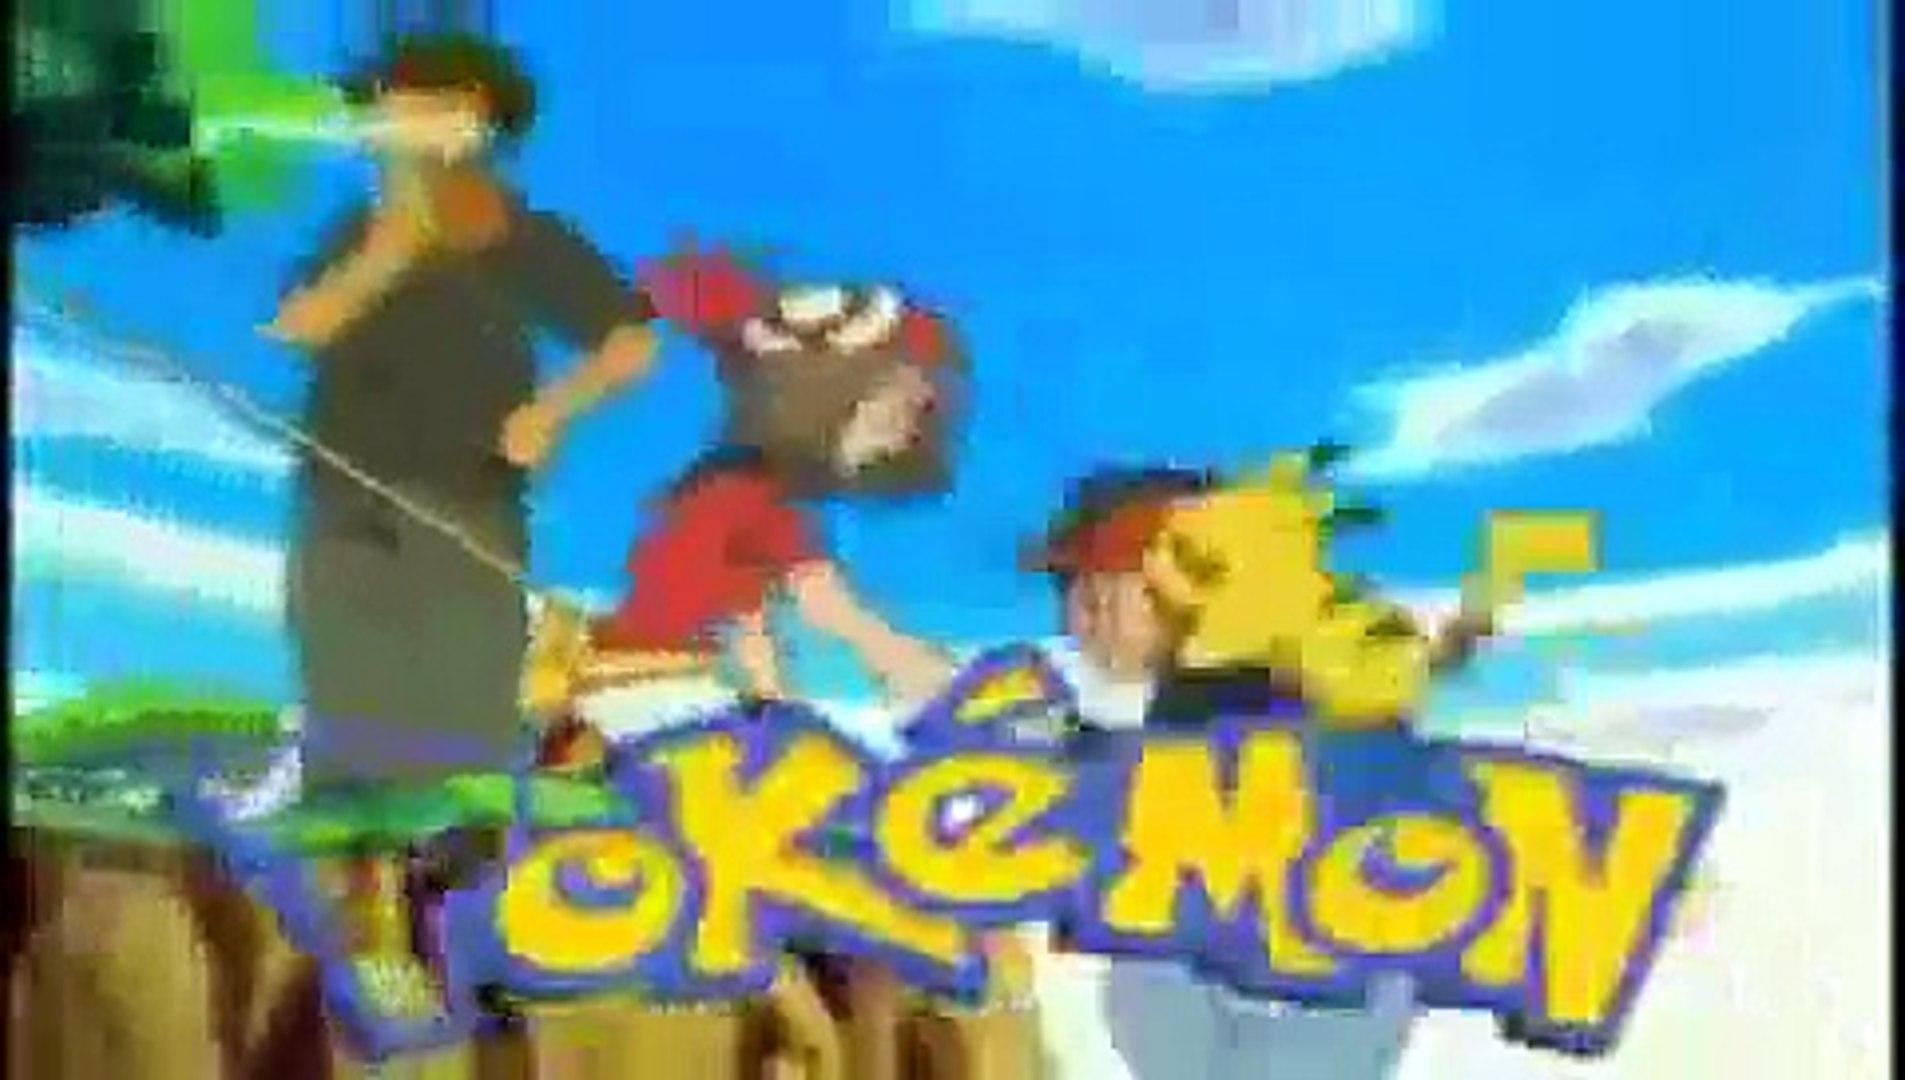 Kirby Lopez Pokemon 2 Game Boy Advance Full Episodes Music Video Song Like Music Good Music